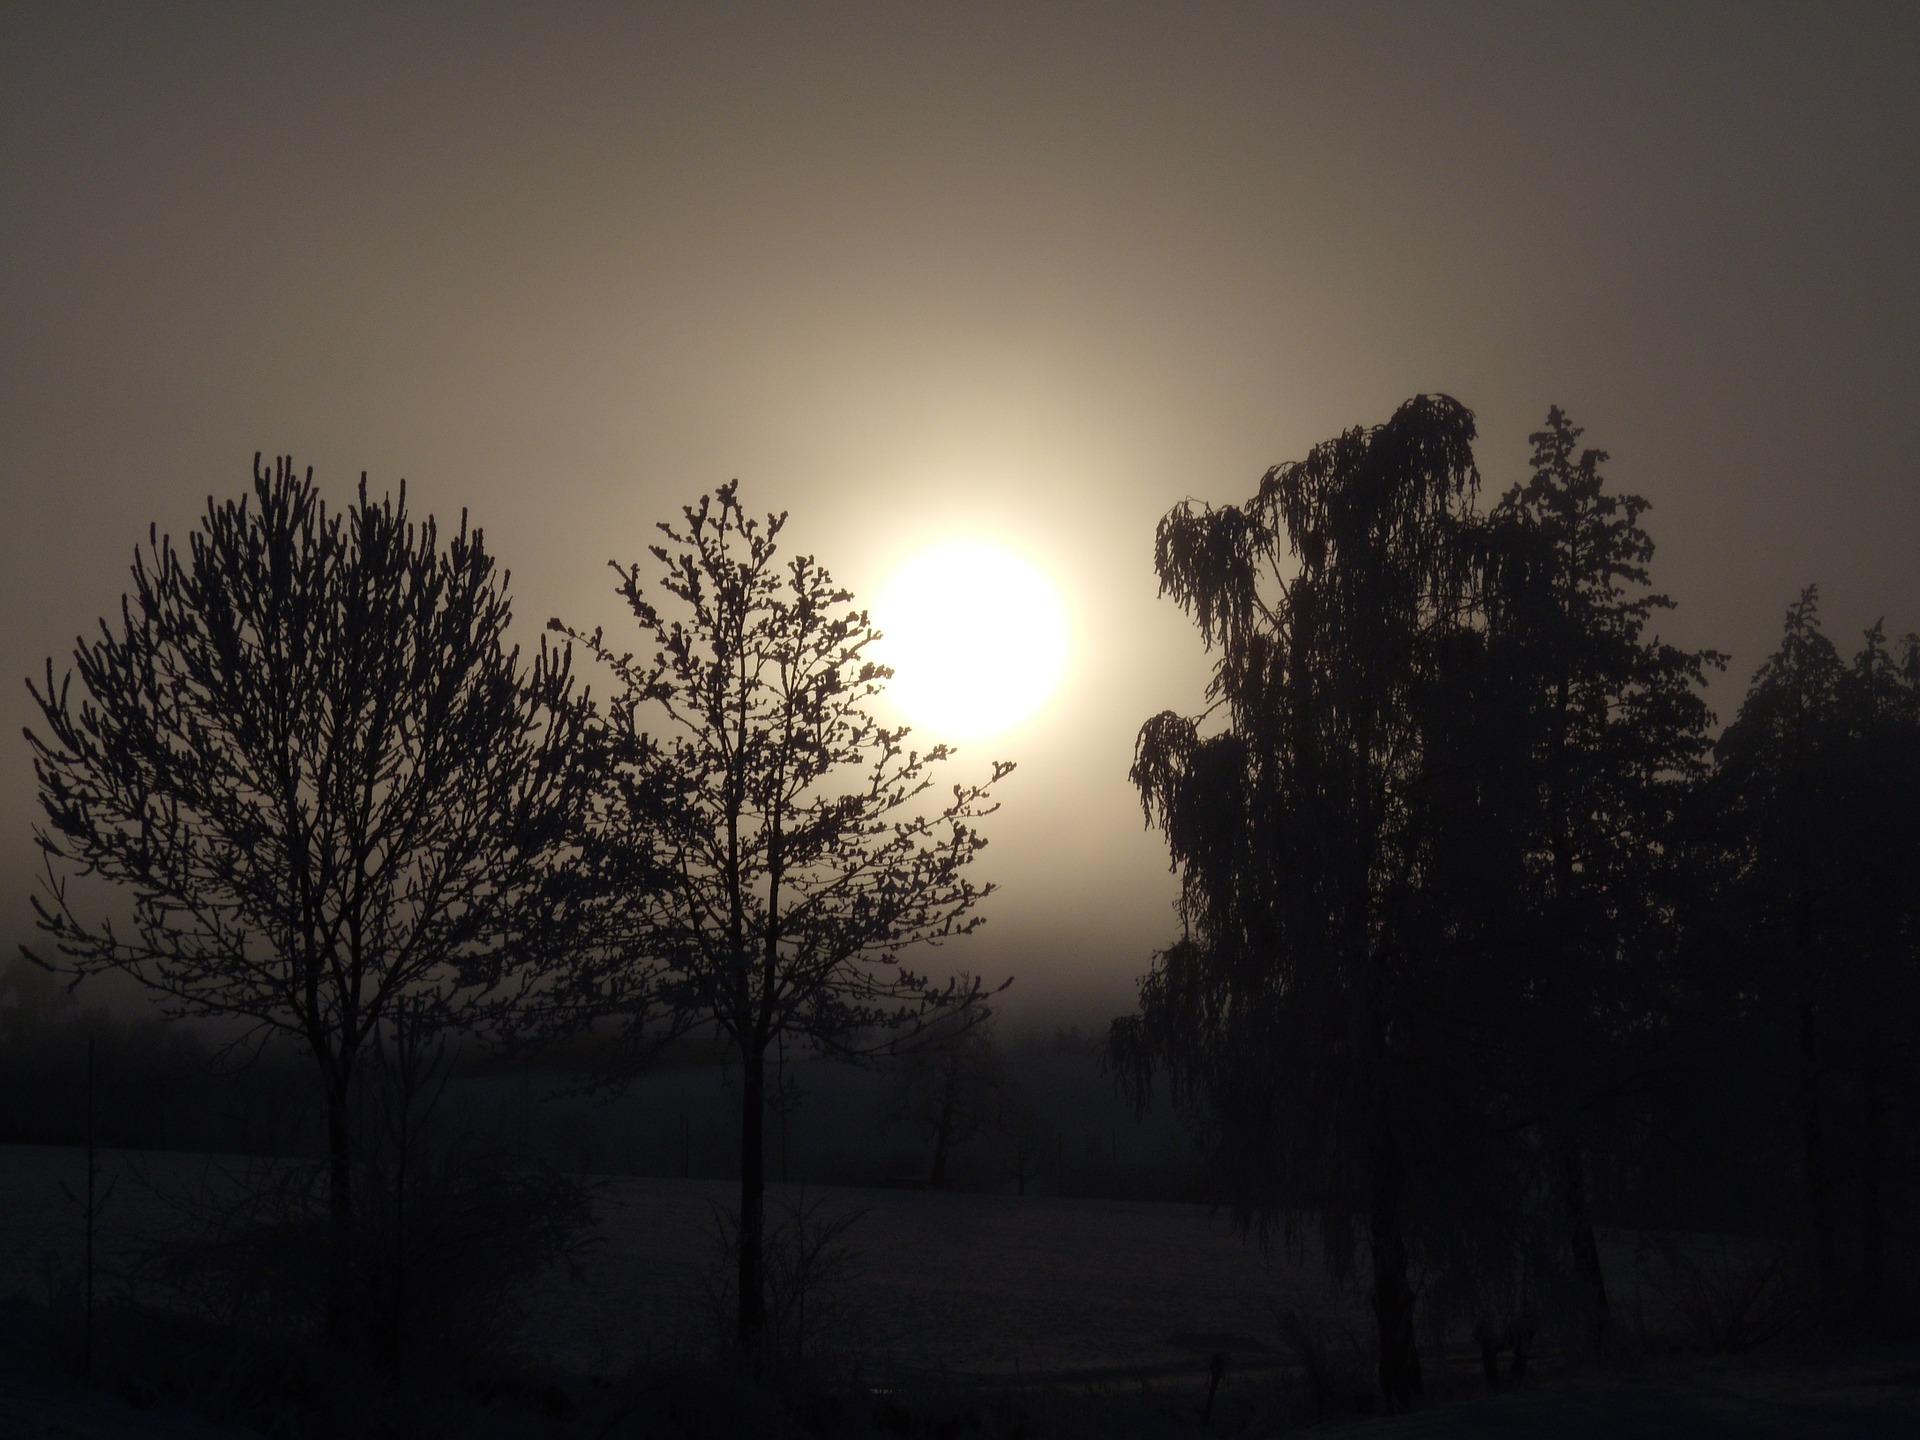 winter-mood-113325_1920.jpg